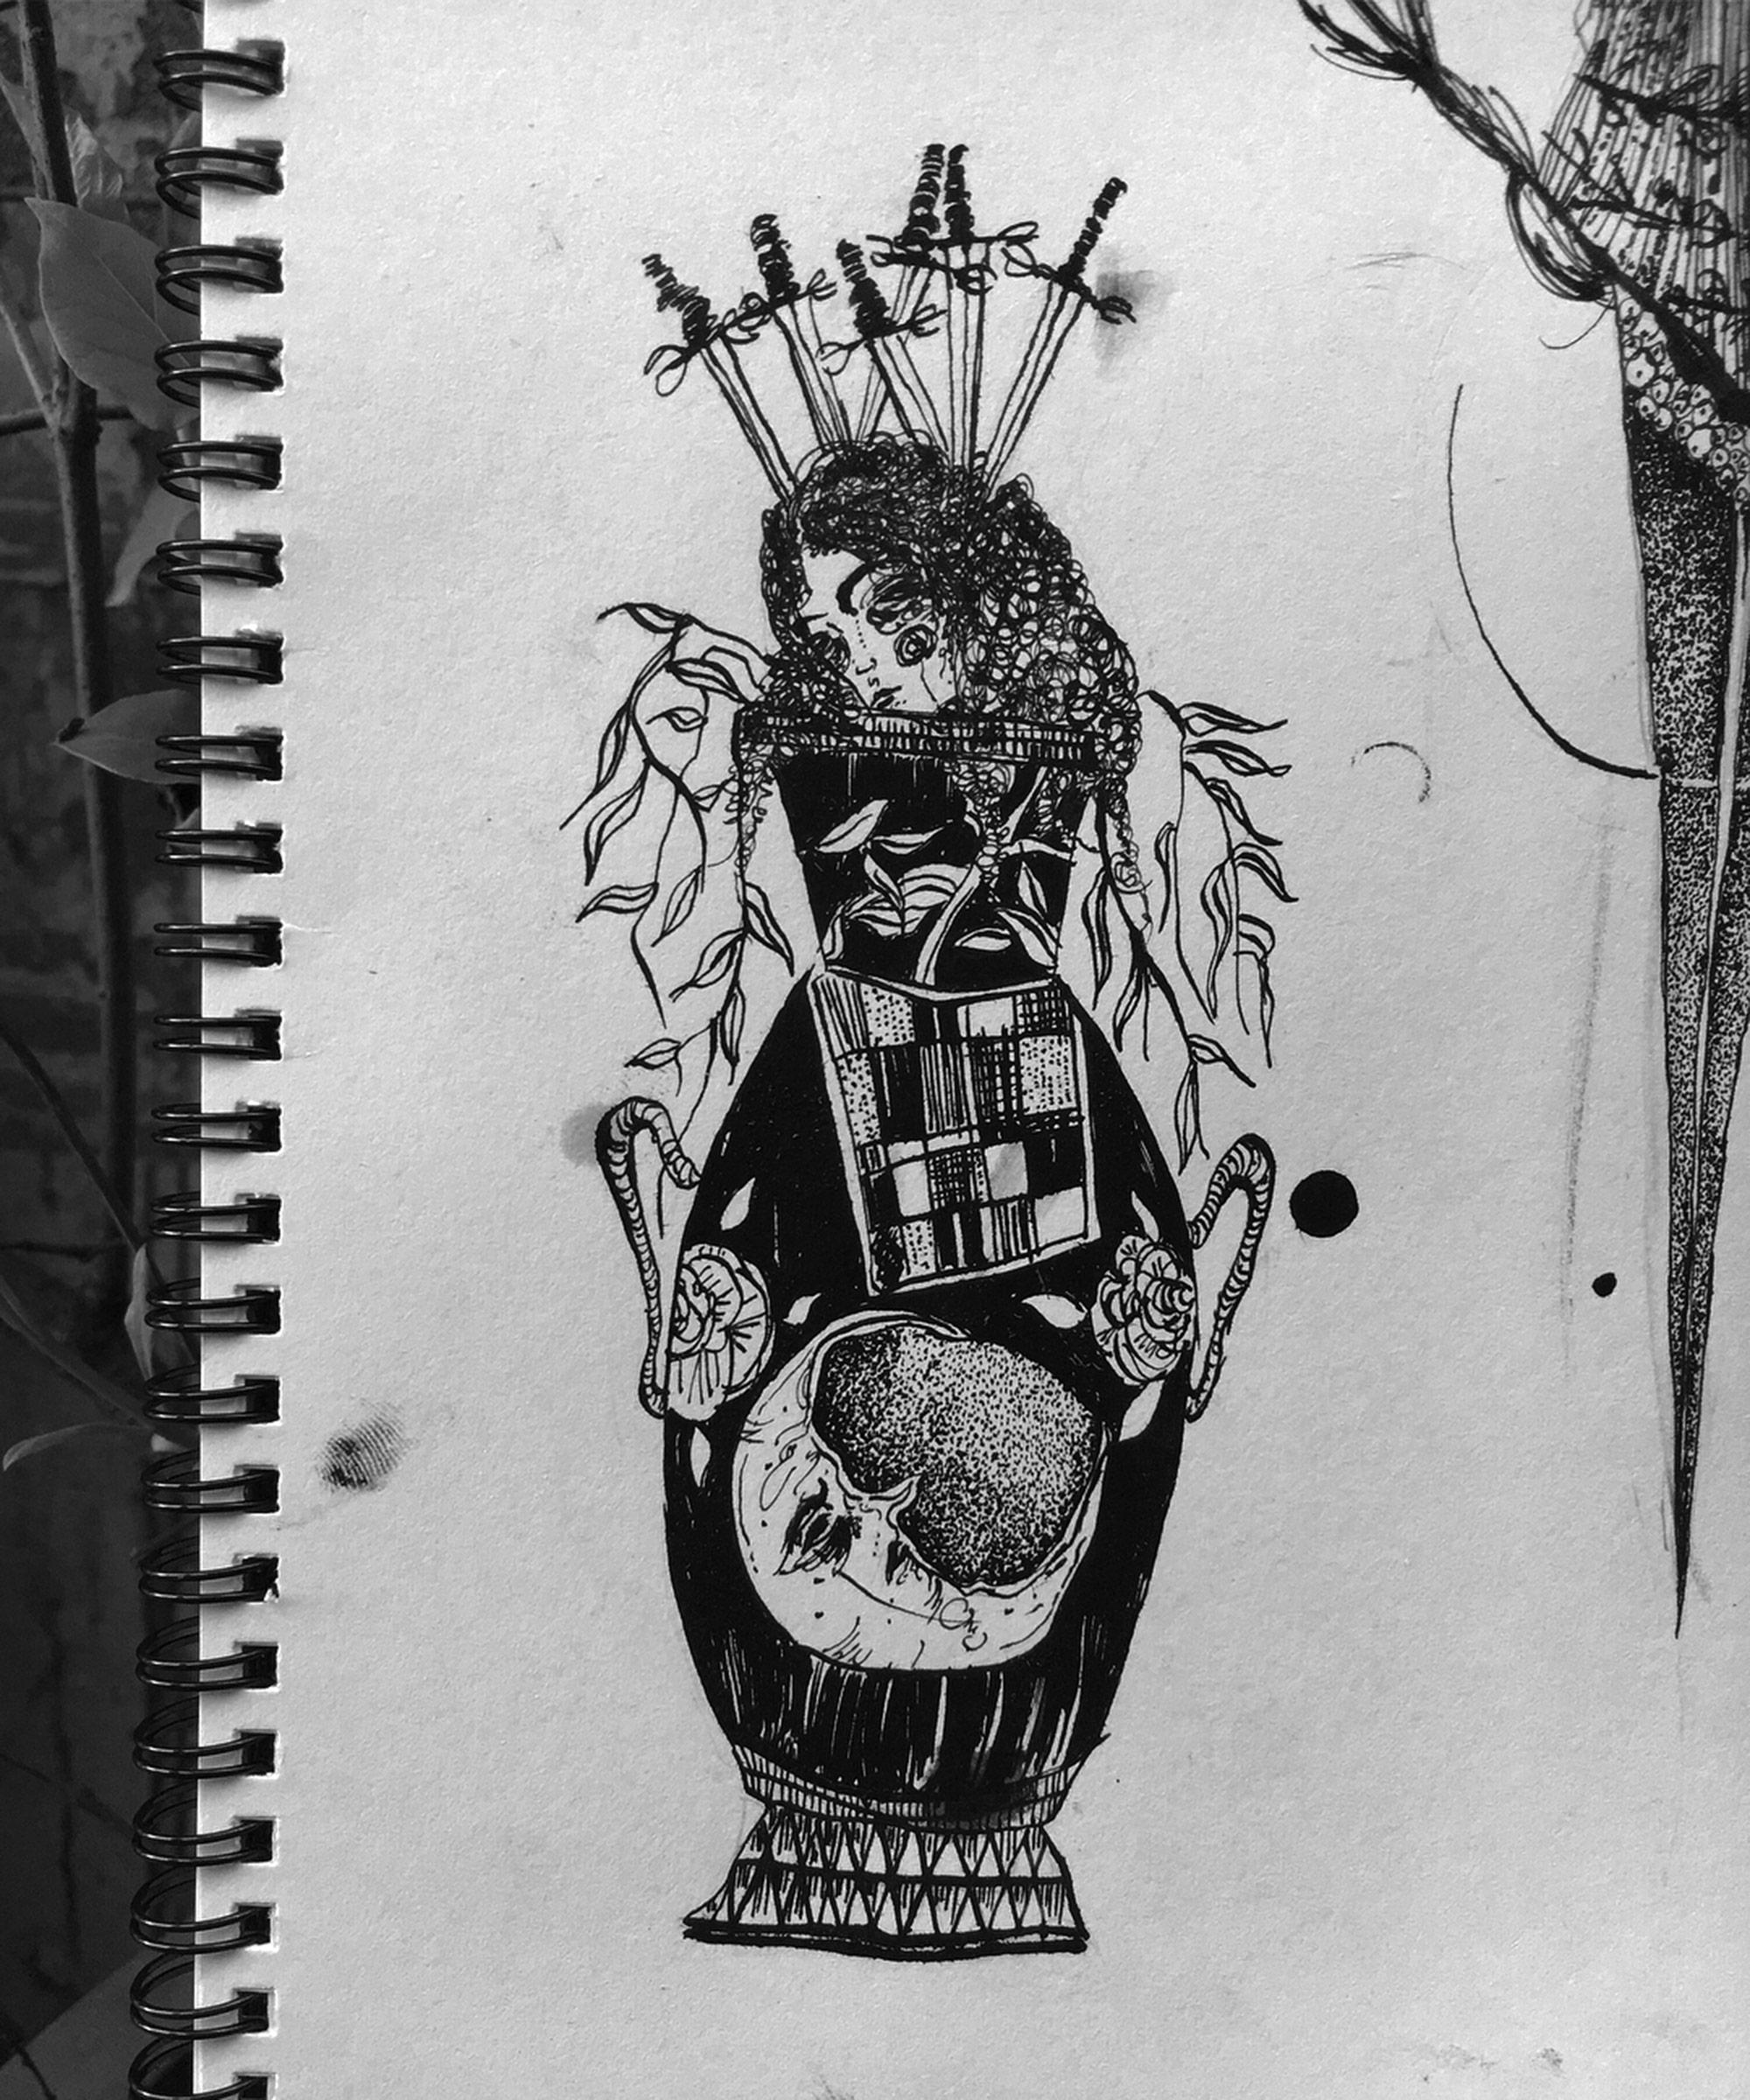 Suhwan Bak - Goth Gloomy tattoo - creepy drawing notebook